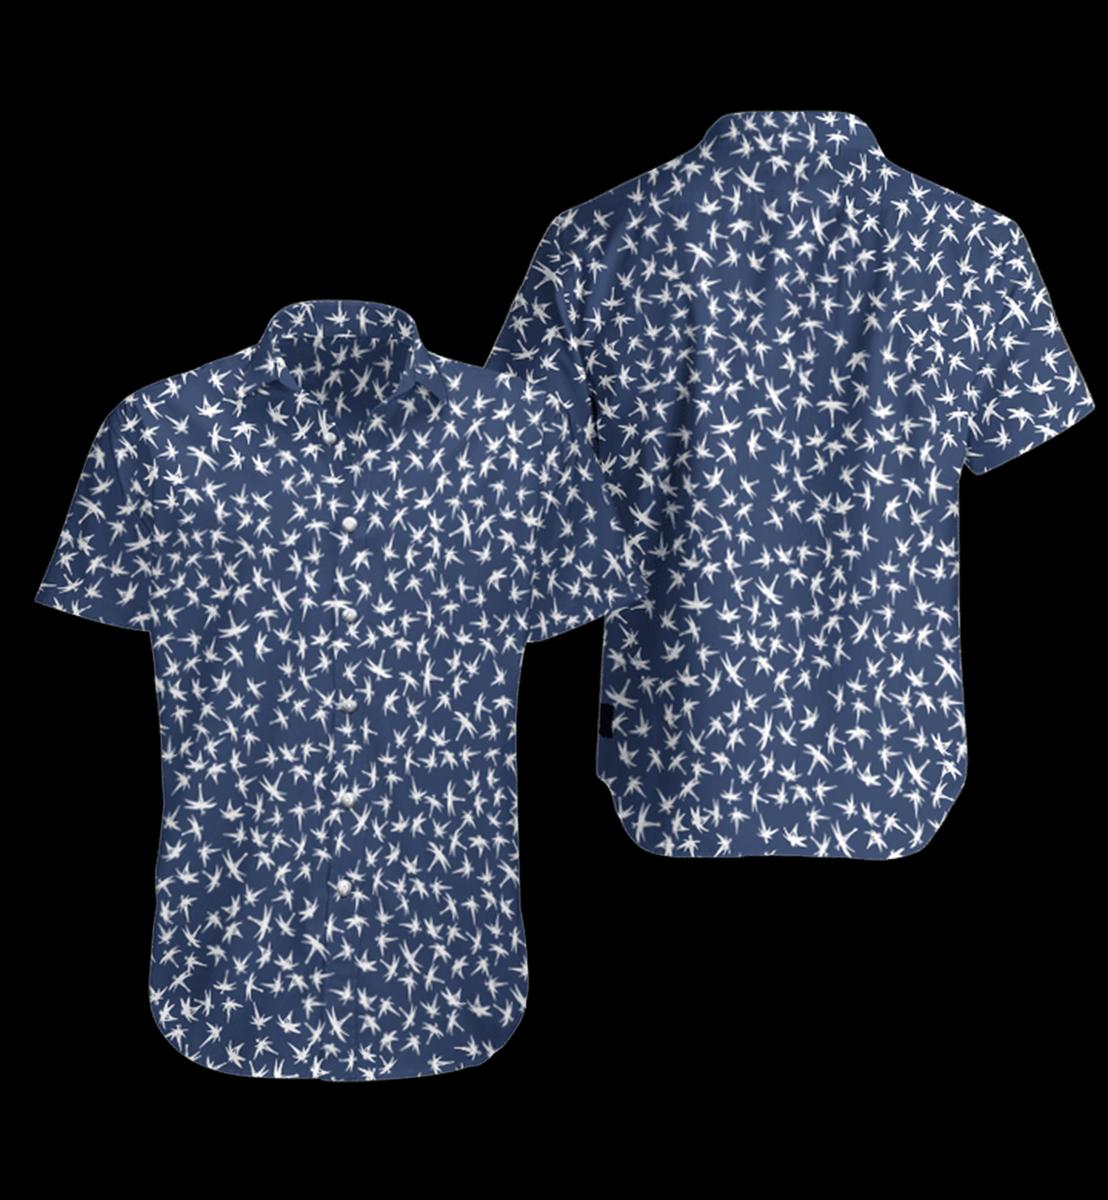 6 Tom Selleck Hawaiian Shirt and Short 1 1